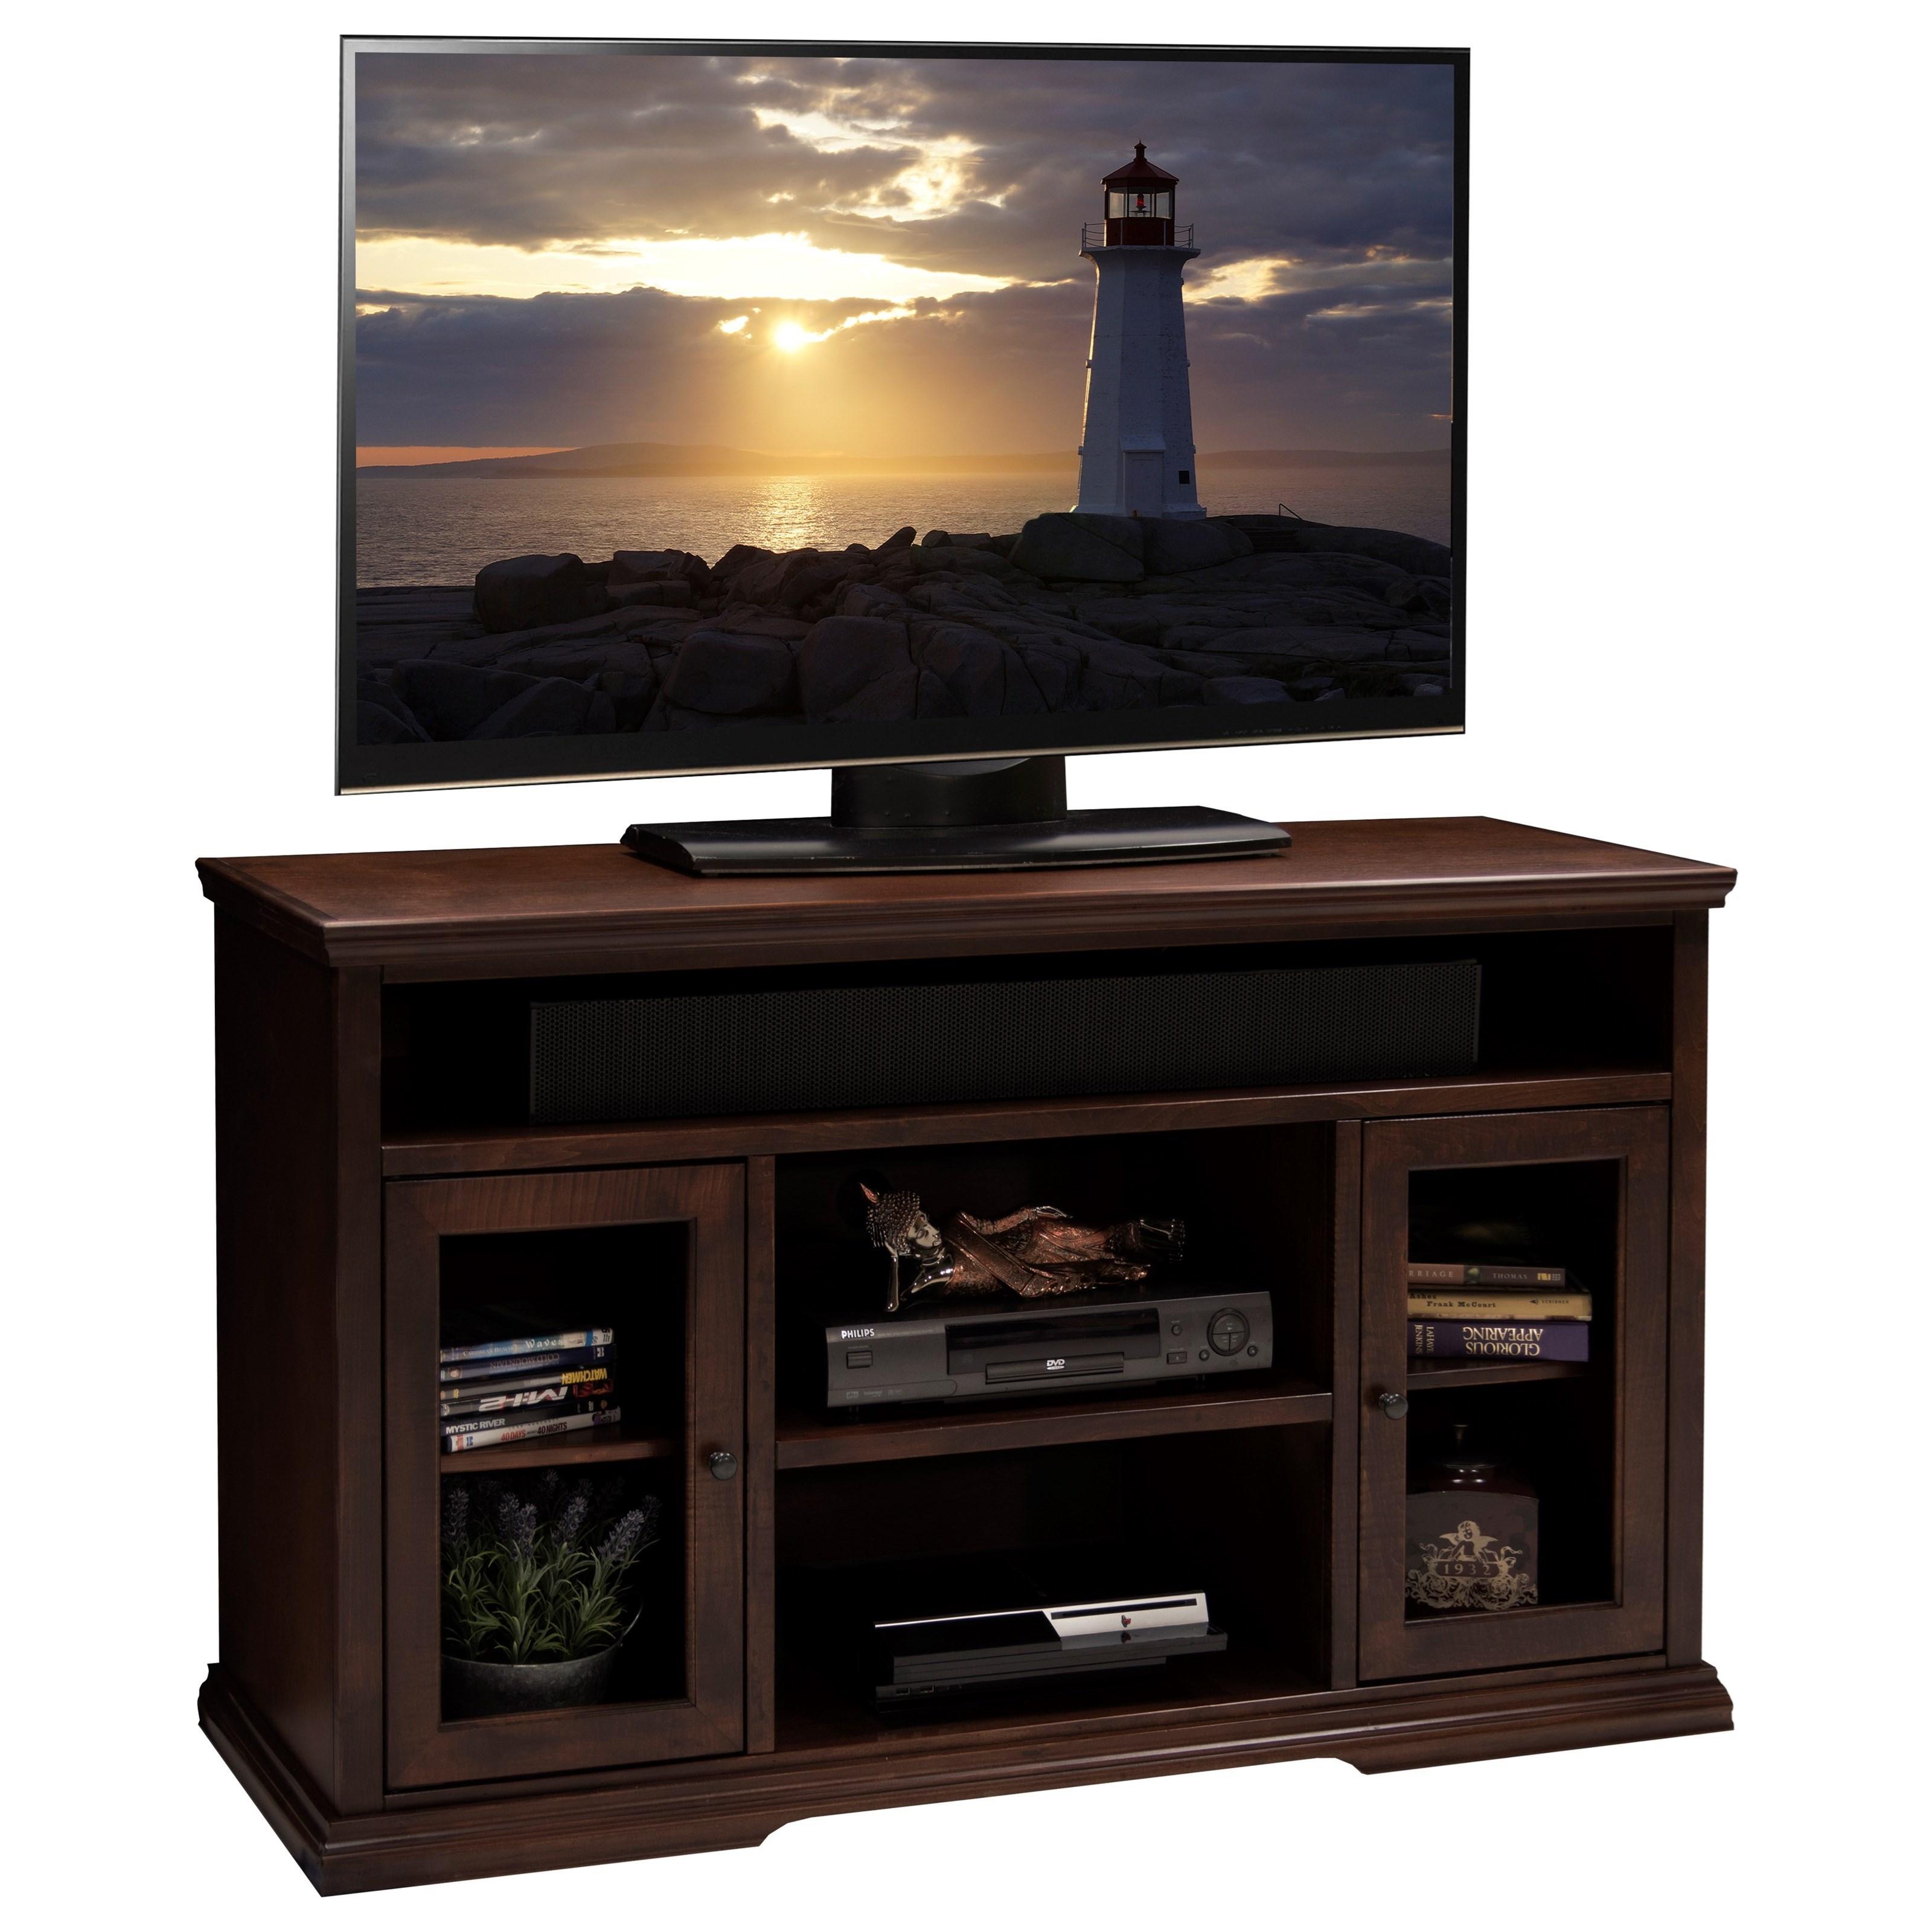 Legends Furniture Ashton Place Ap1327 Dnc 54 Inch Tall Tv